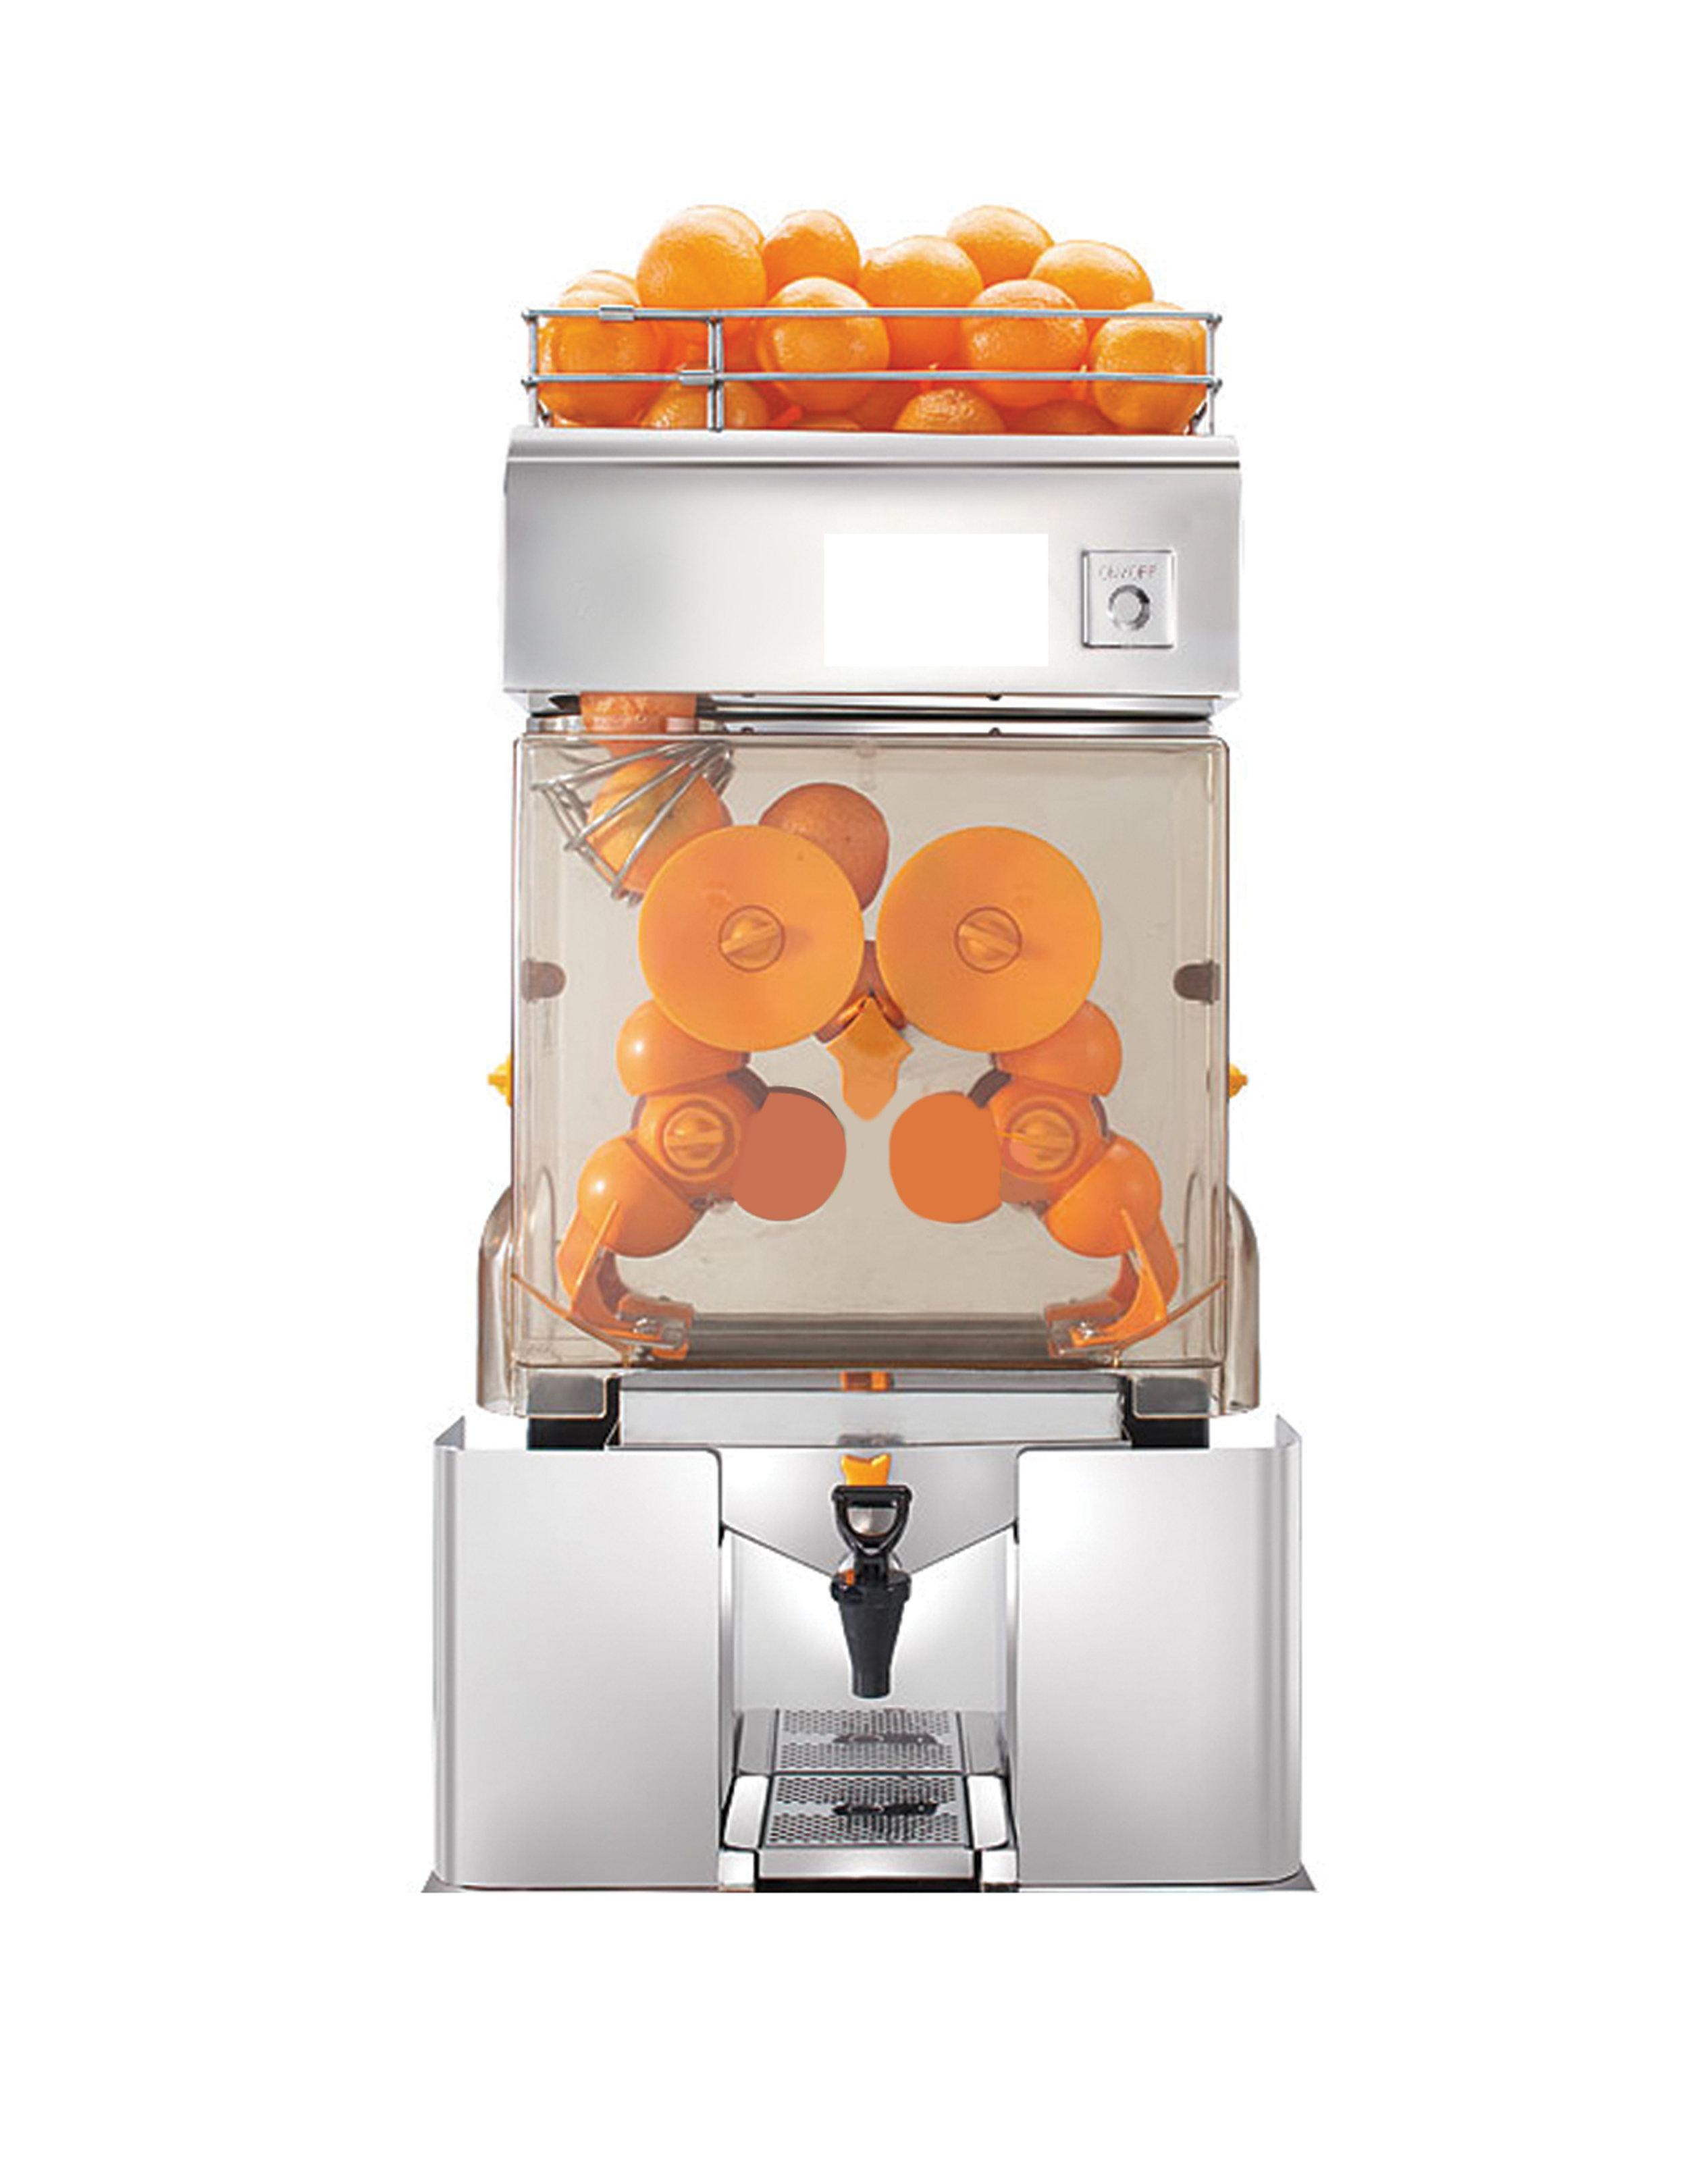 citra-cruz-20s-citrus-juicer.jpg